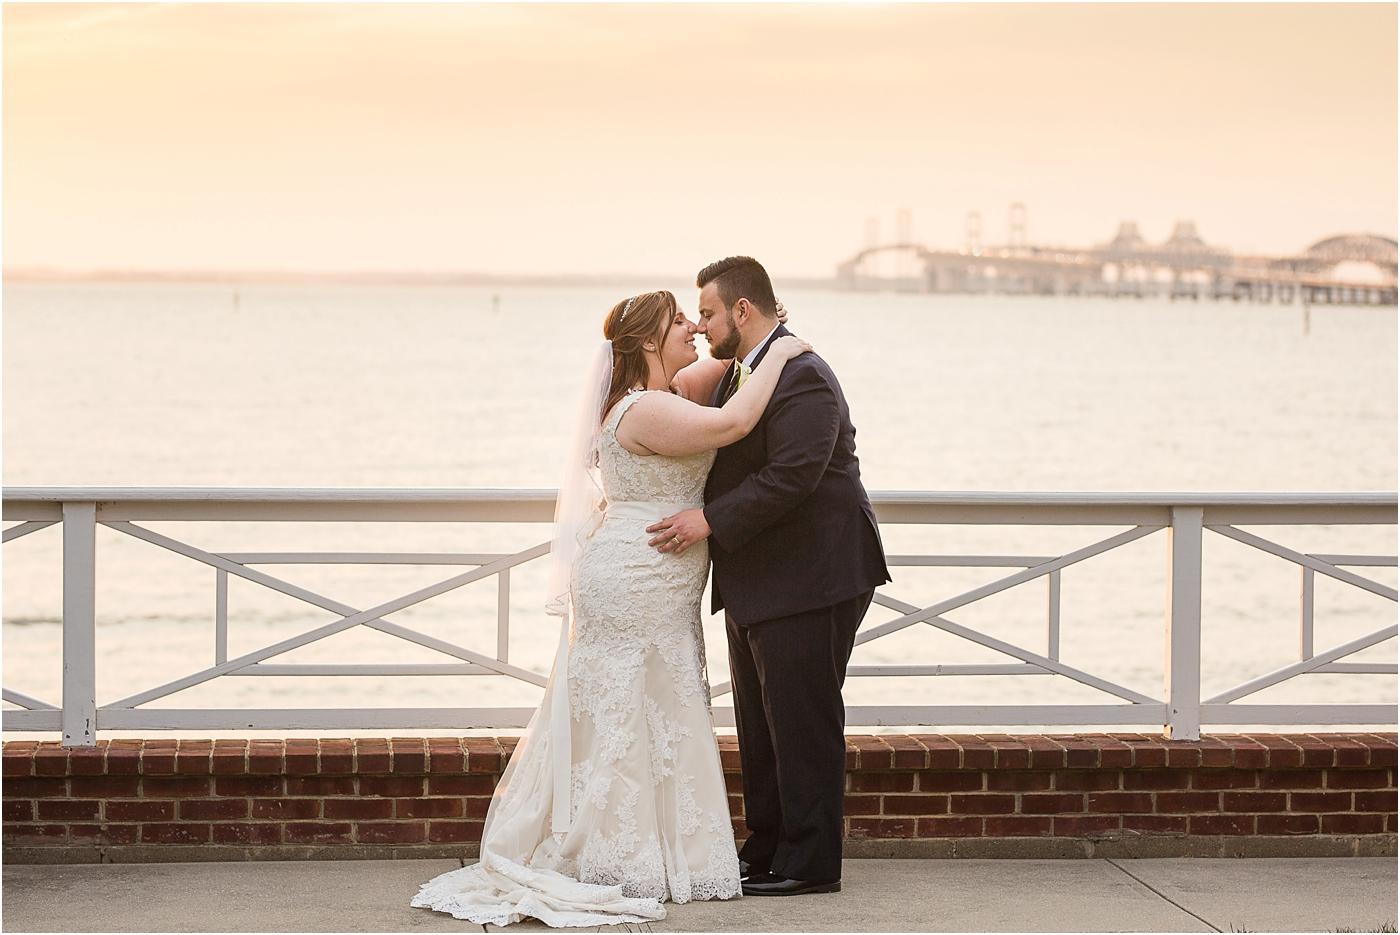 Chesapeake-Bay-Beach-Club-Wedding-77.jpg